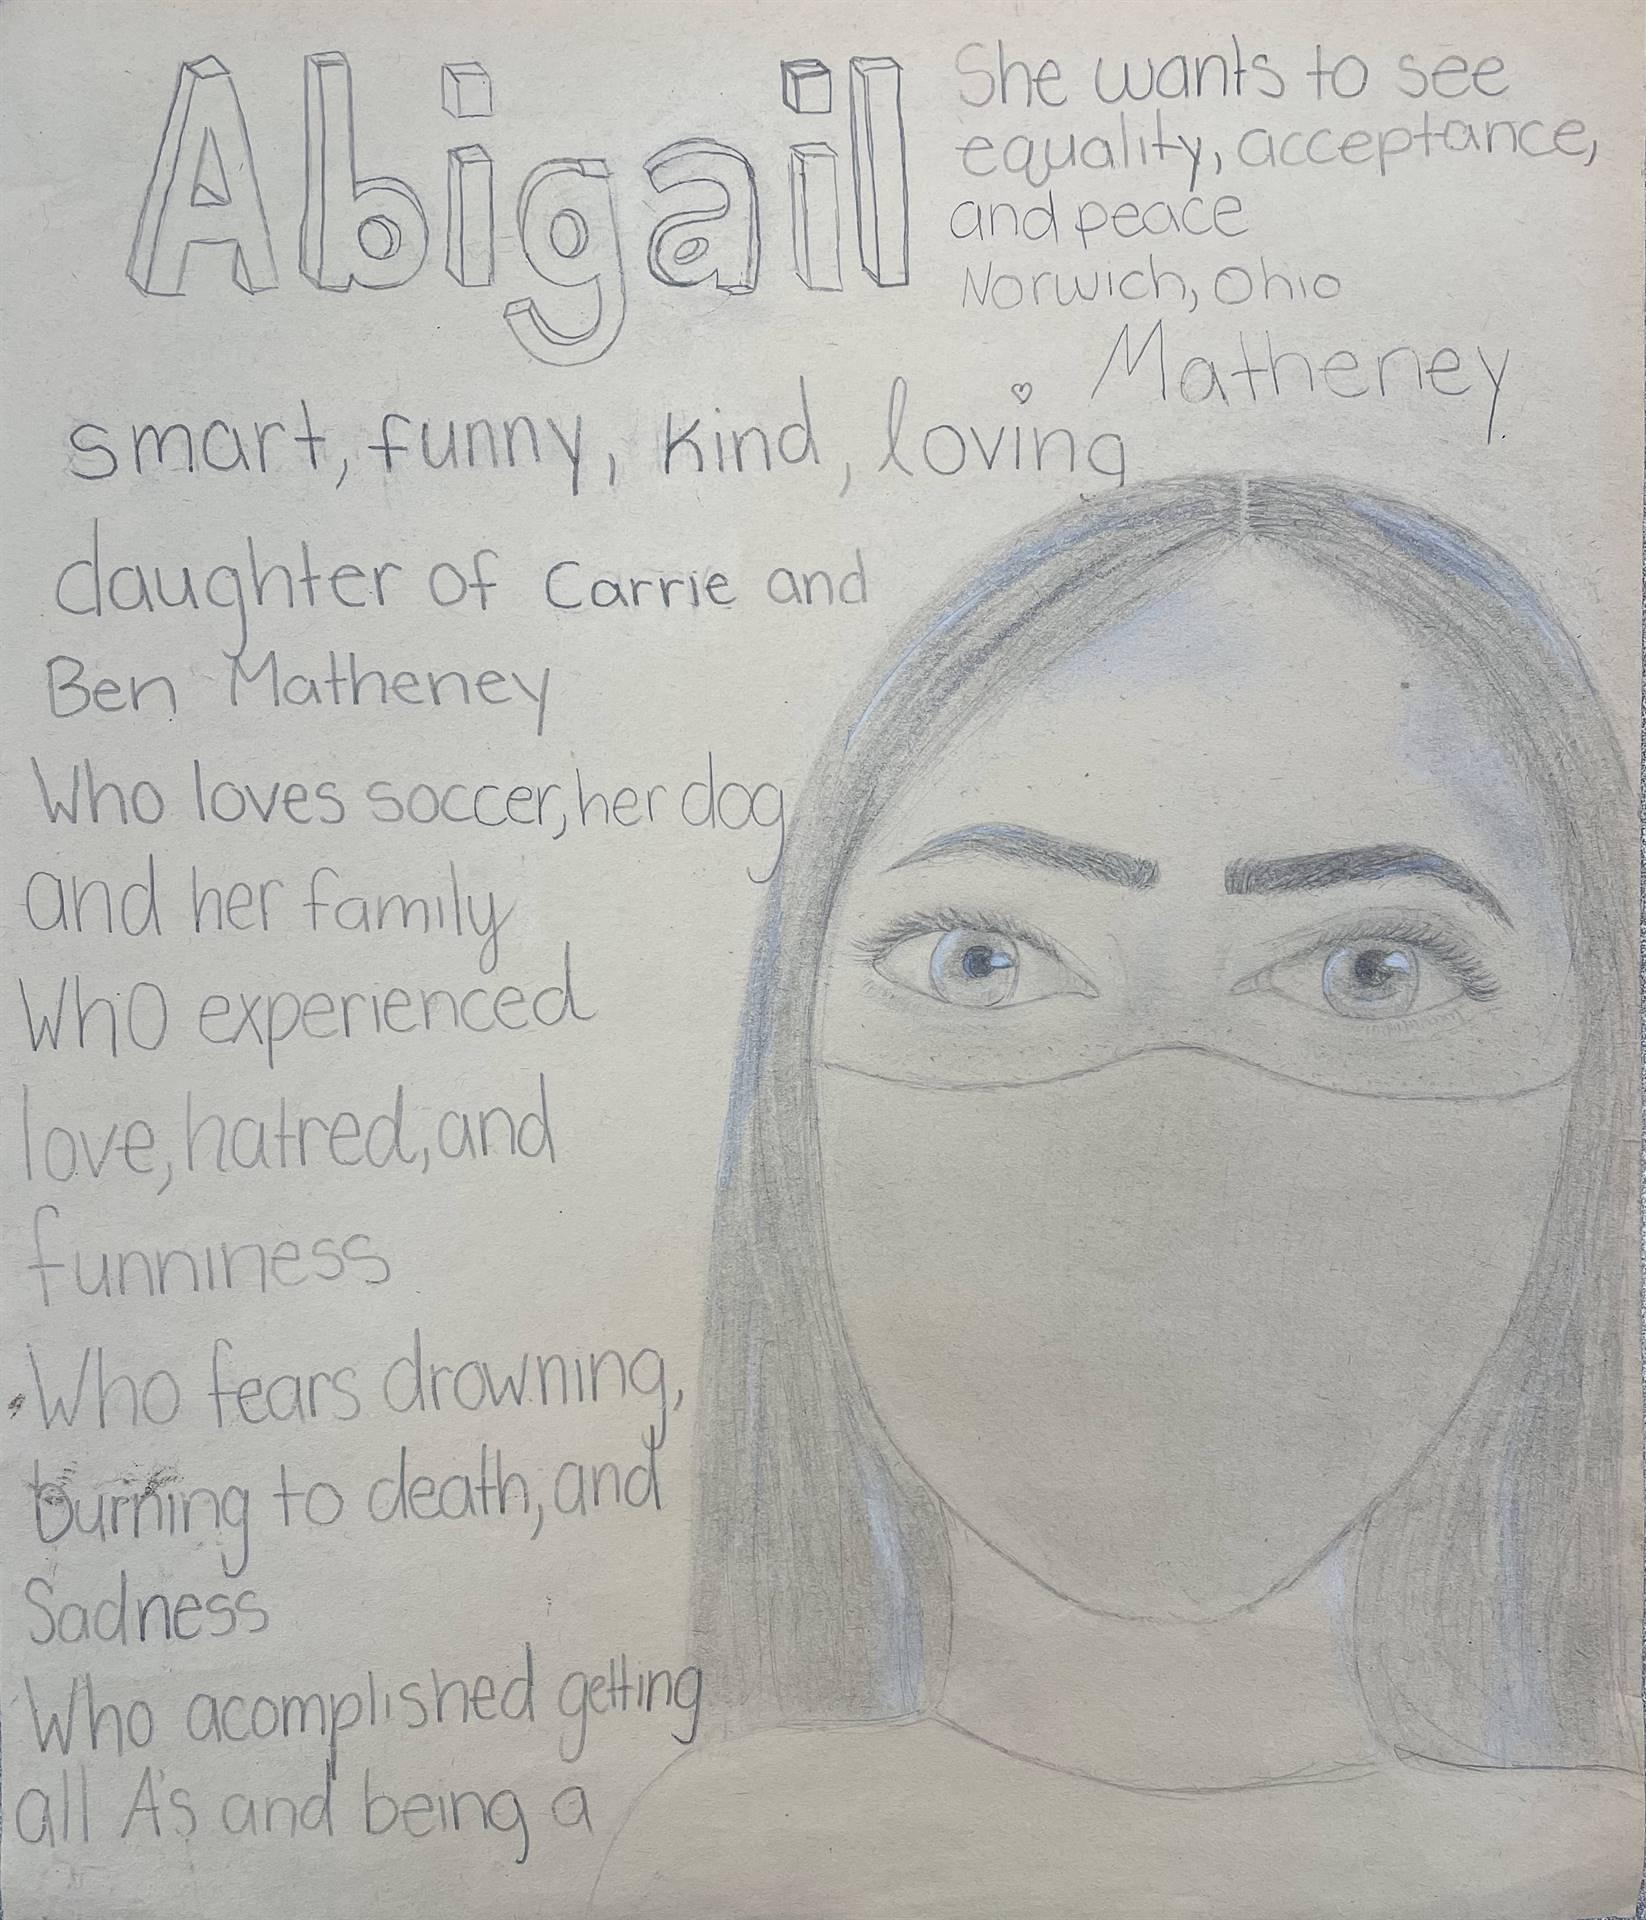 Abigail Matheney